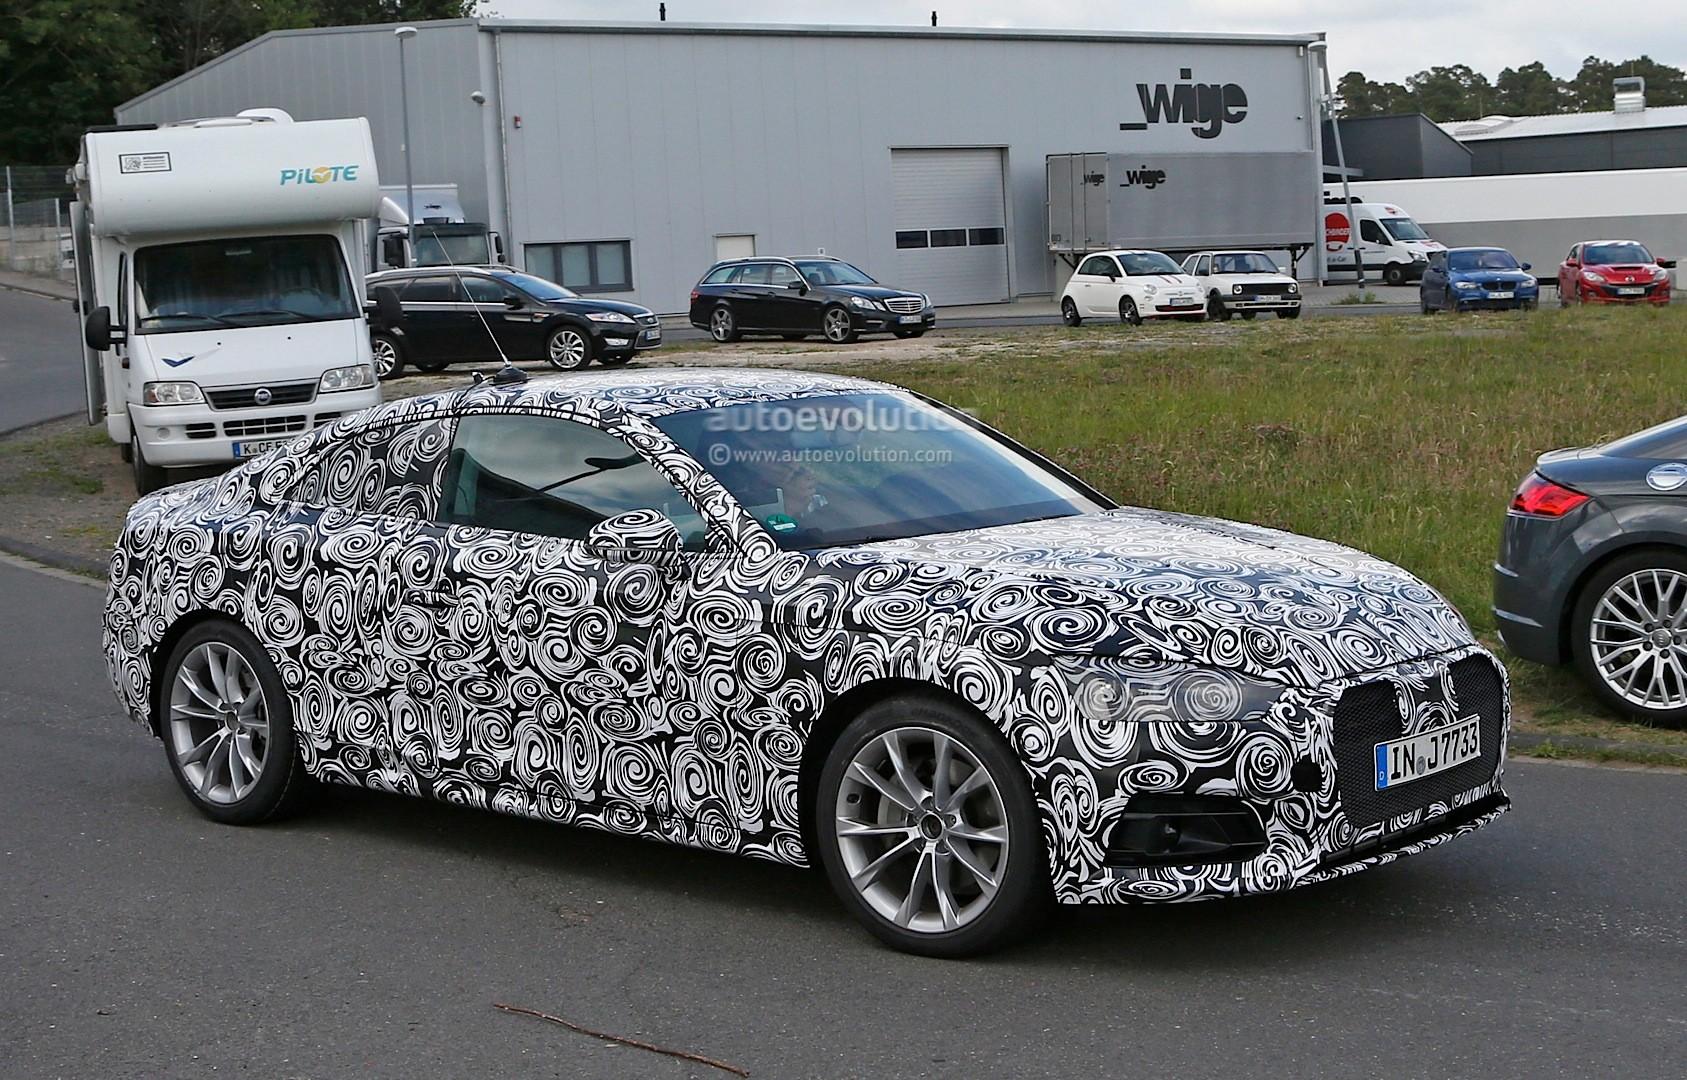 2016 - [Audi] A5 Coupé, Cabriolet et Sportback - Page 2 All-new-2017-audi-a5-coupe-first-spy-photos-show-evolutionary-design_3